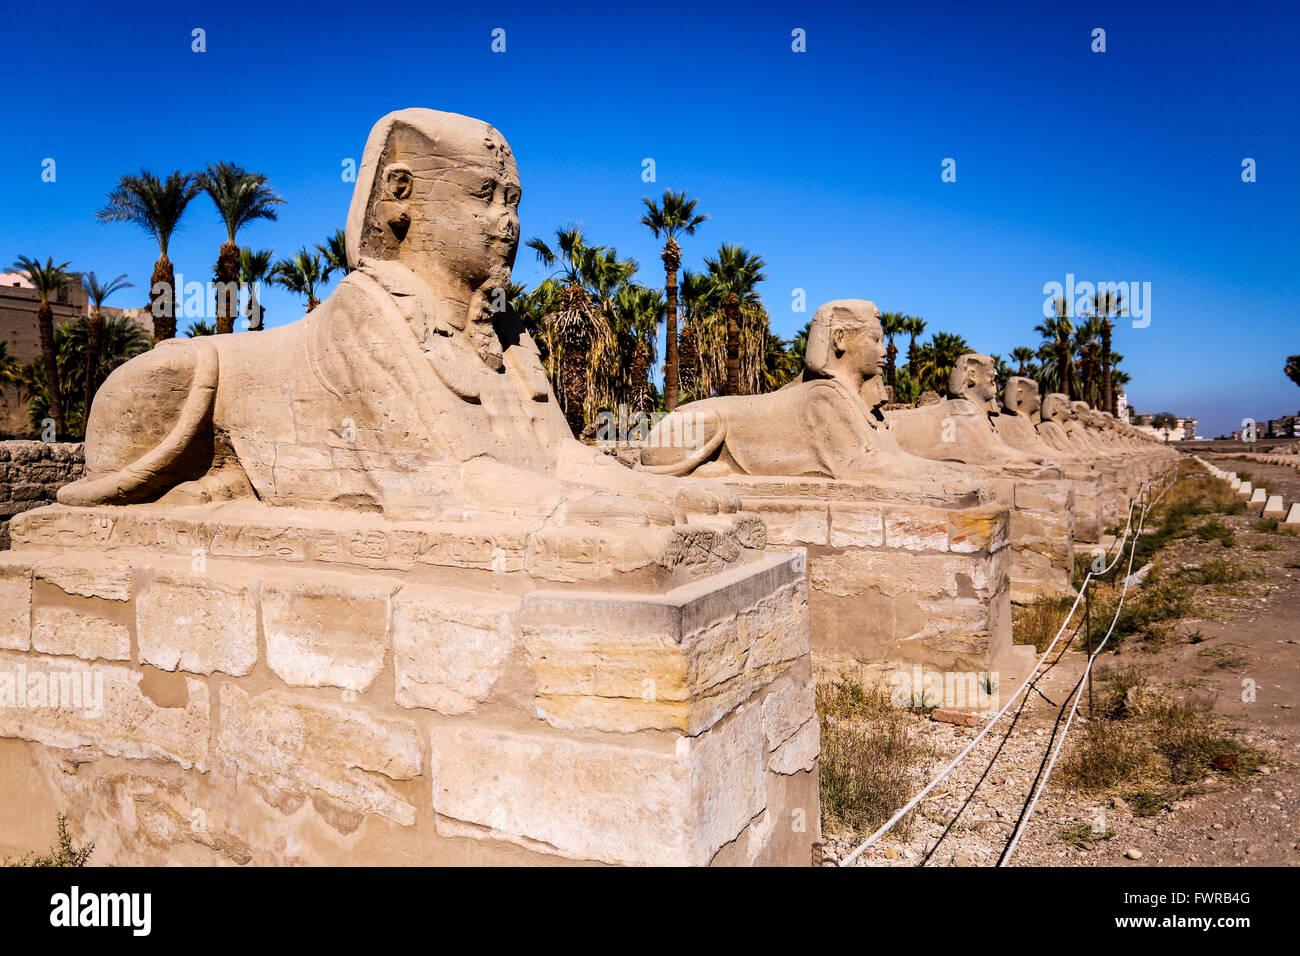 L'Avenue de sphinx de l'Egypte en Luxor Luxor Temple Photo Stock